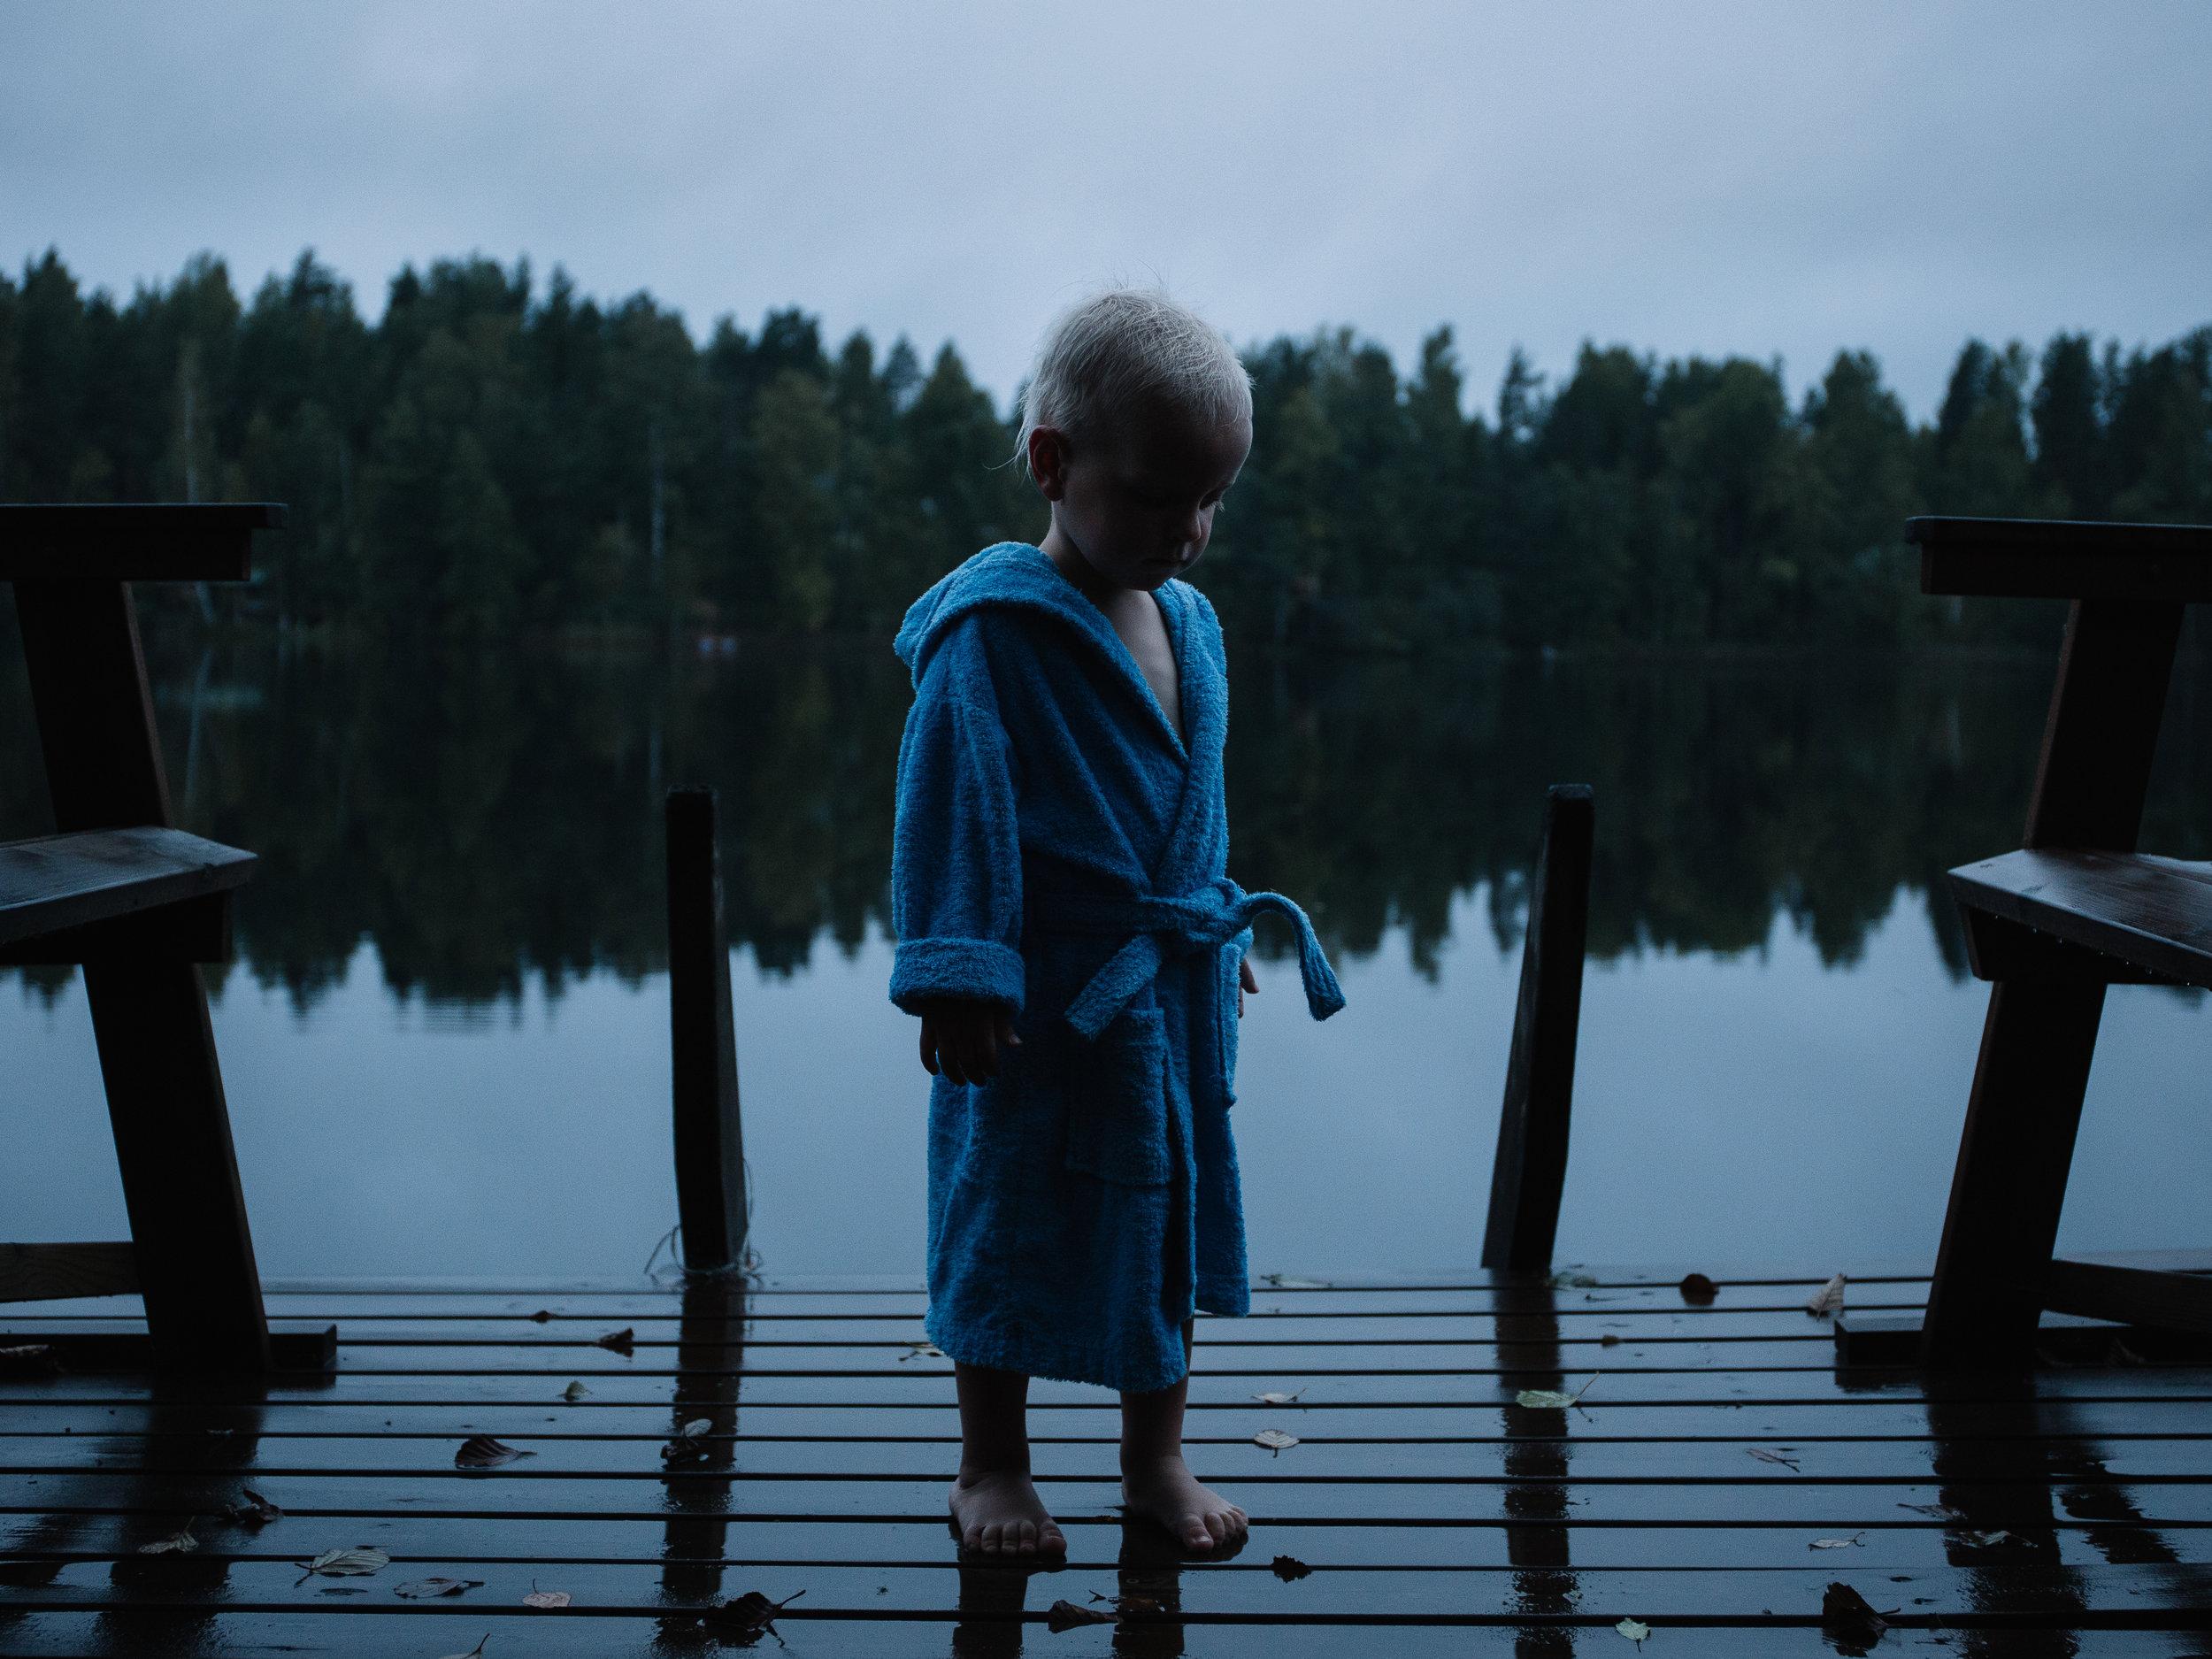 Päijänne Tavastia, Finland, September 2017